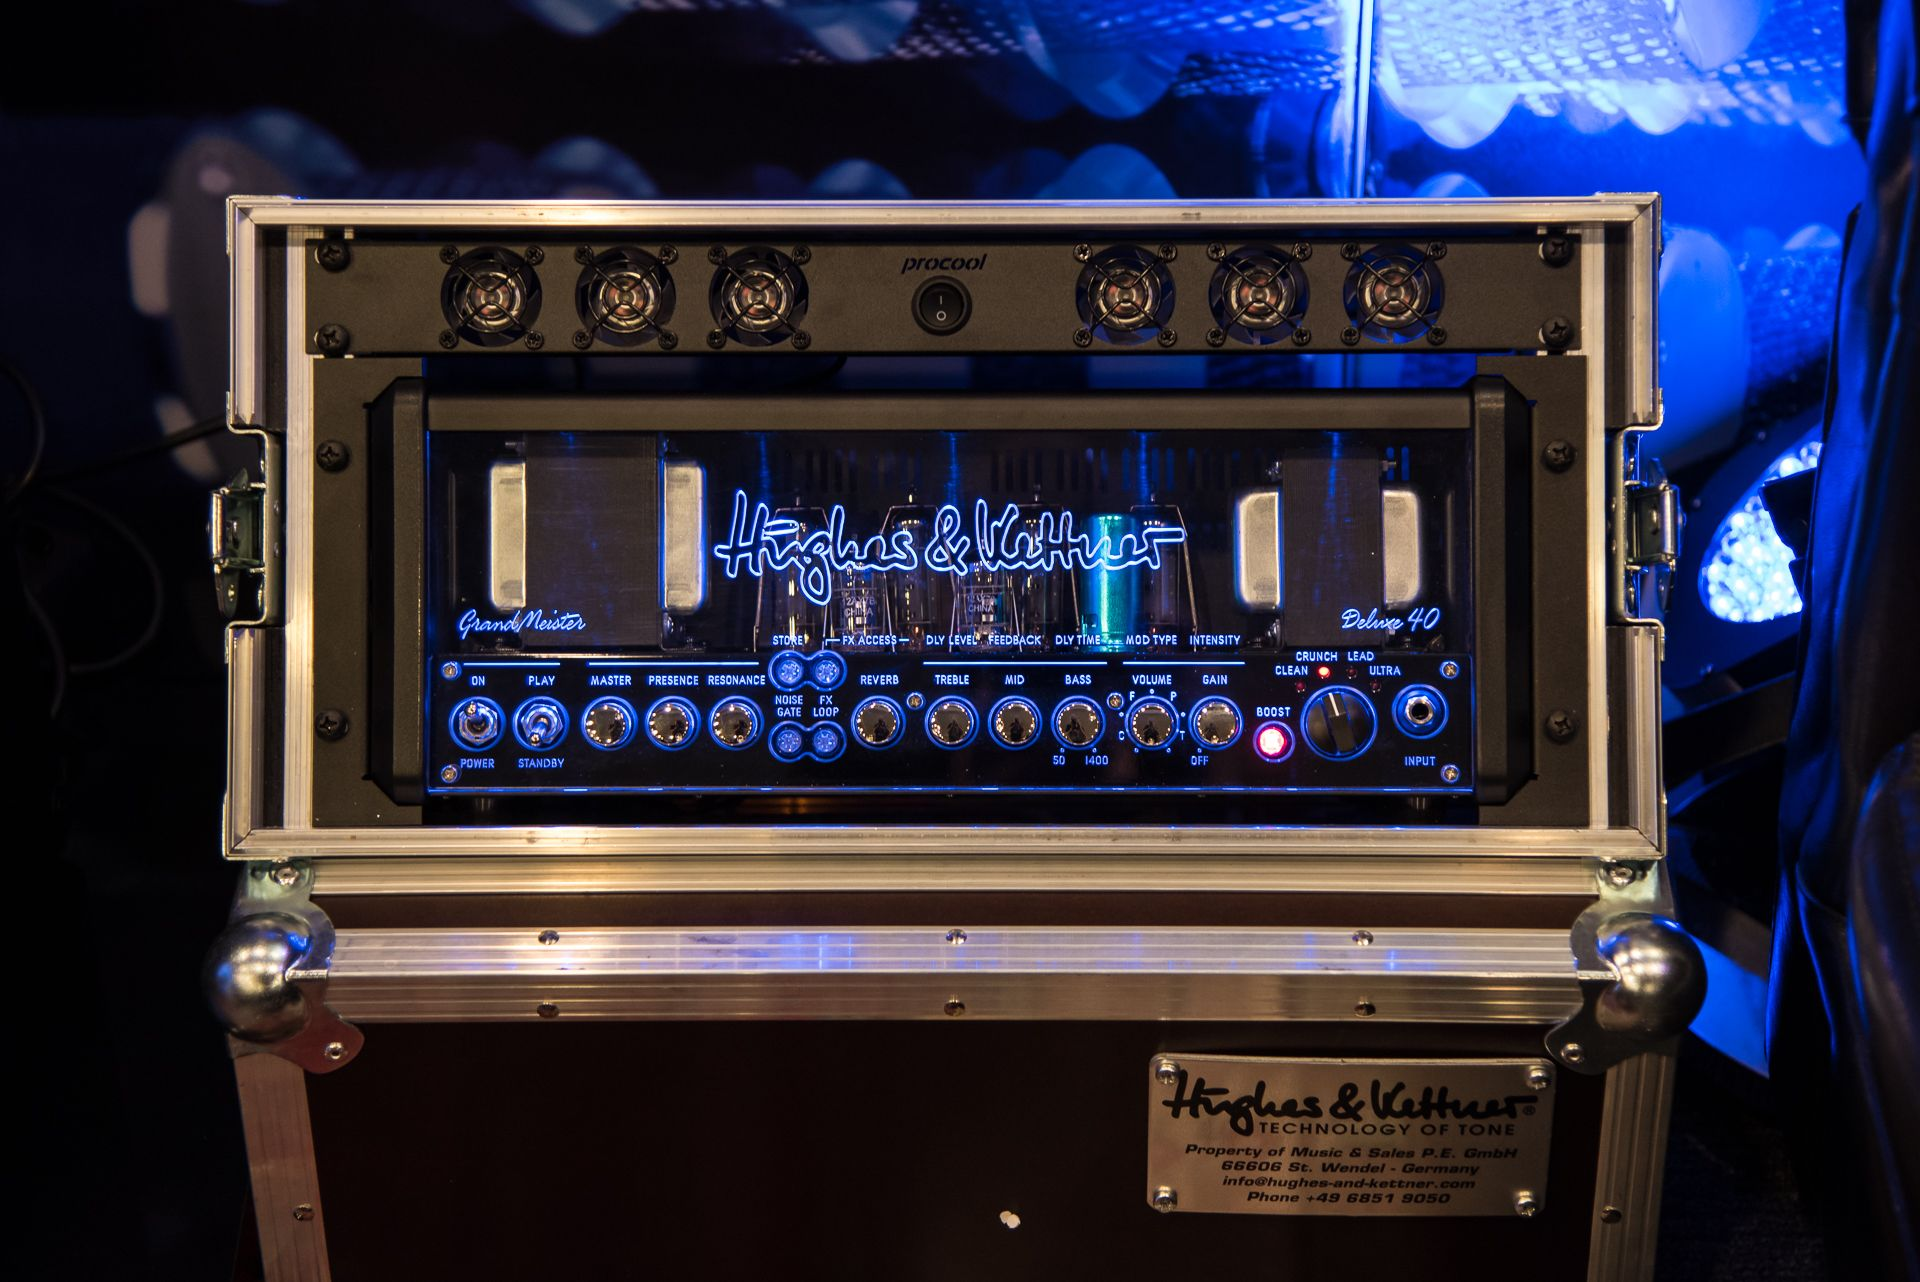 The Hughes Kettner Grandmeister Deluxe 40 Tube Guitar Amplifier In The Official H K Rack Mount Set Get Your Grandmeister In A Standar Rack Settings Mounting